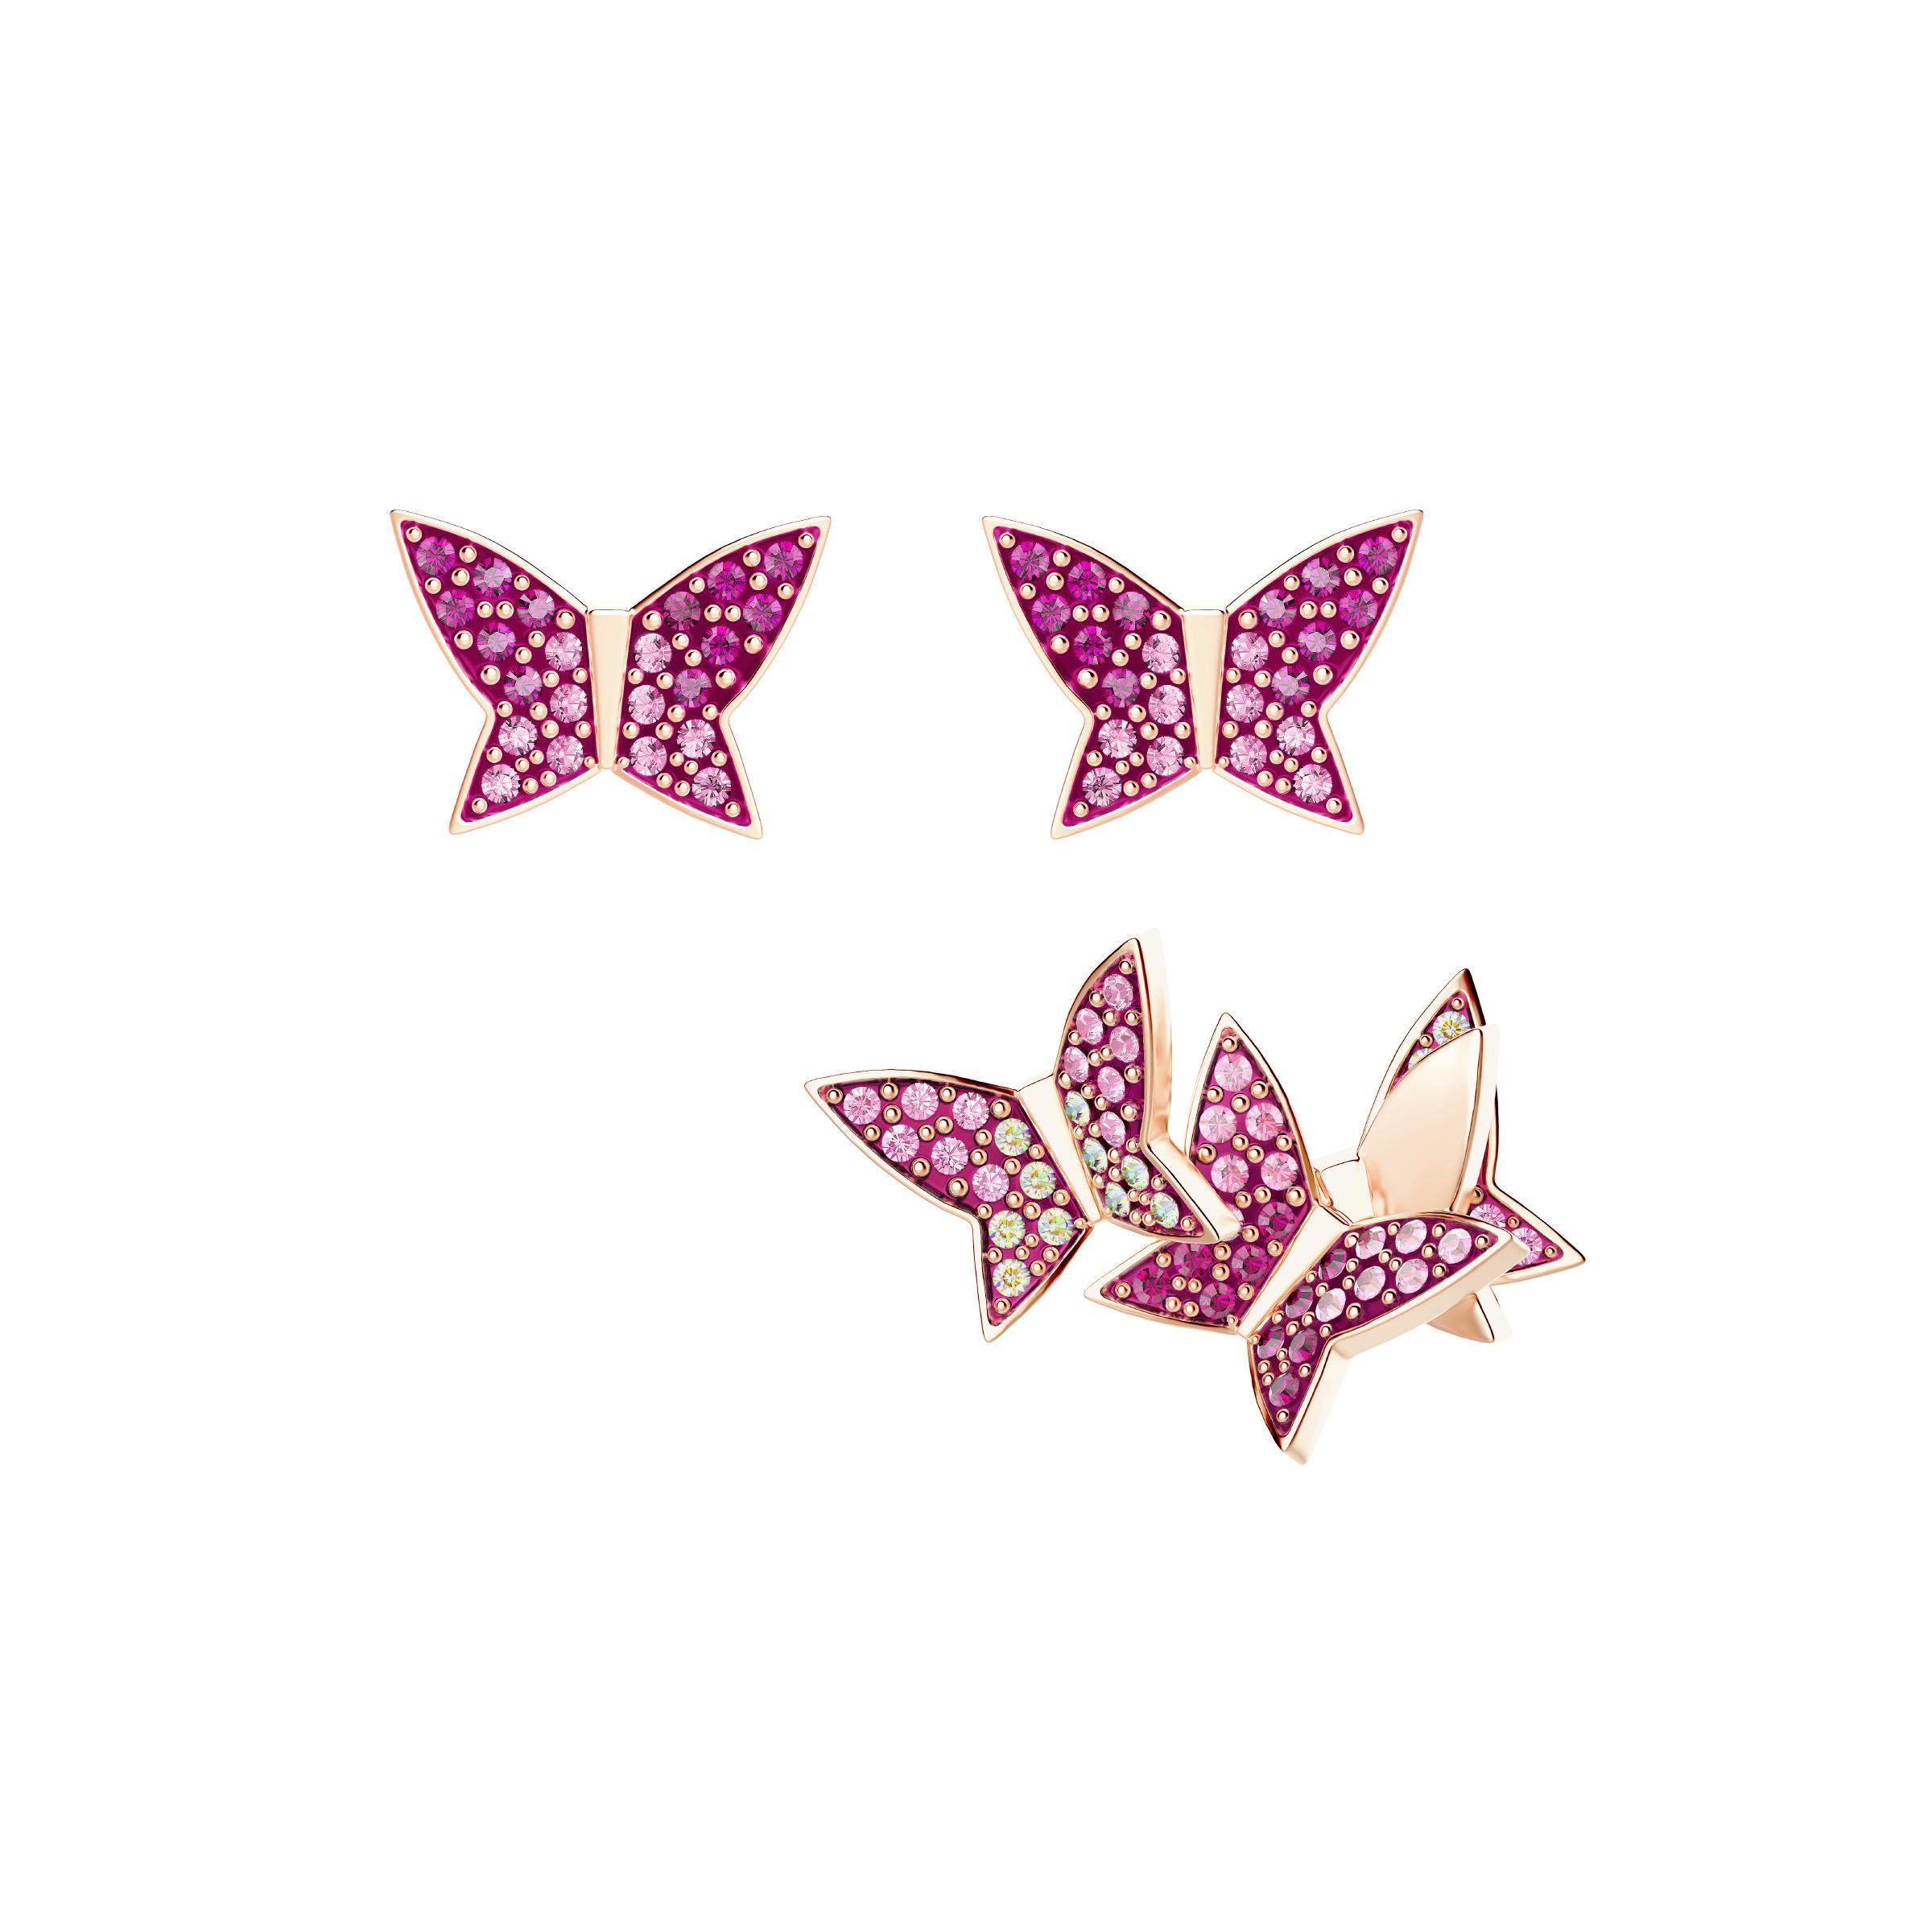 SWAROVSKI_7_LILIA EARRINGS (1)_PVP 69 EUR